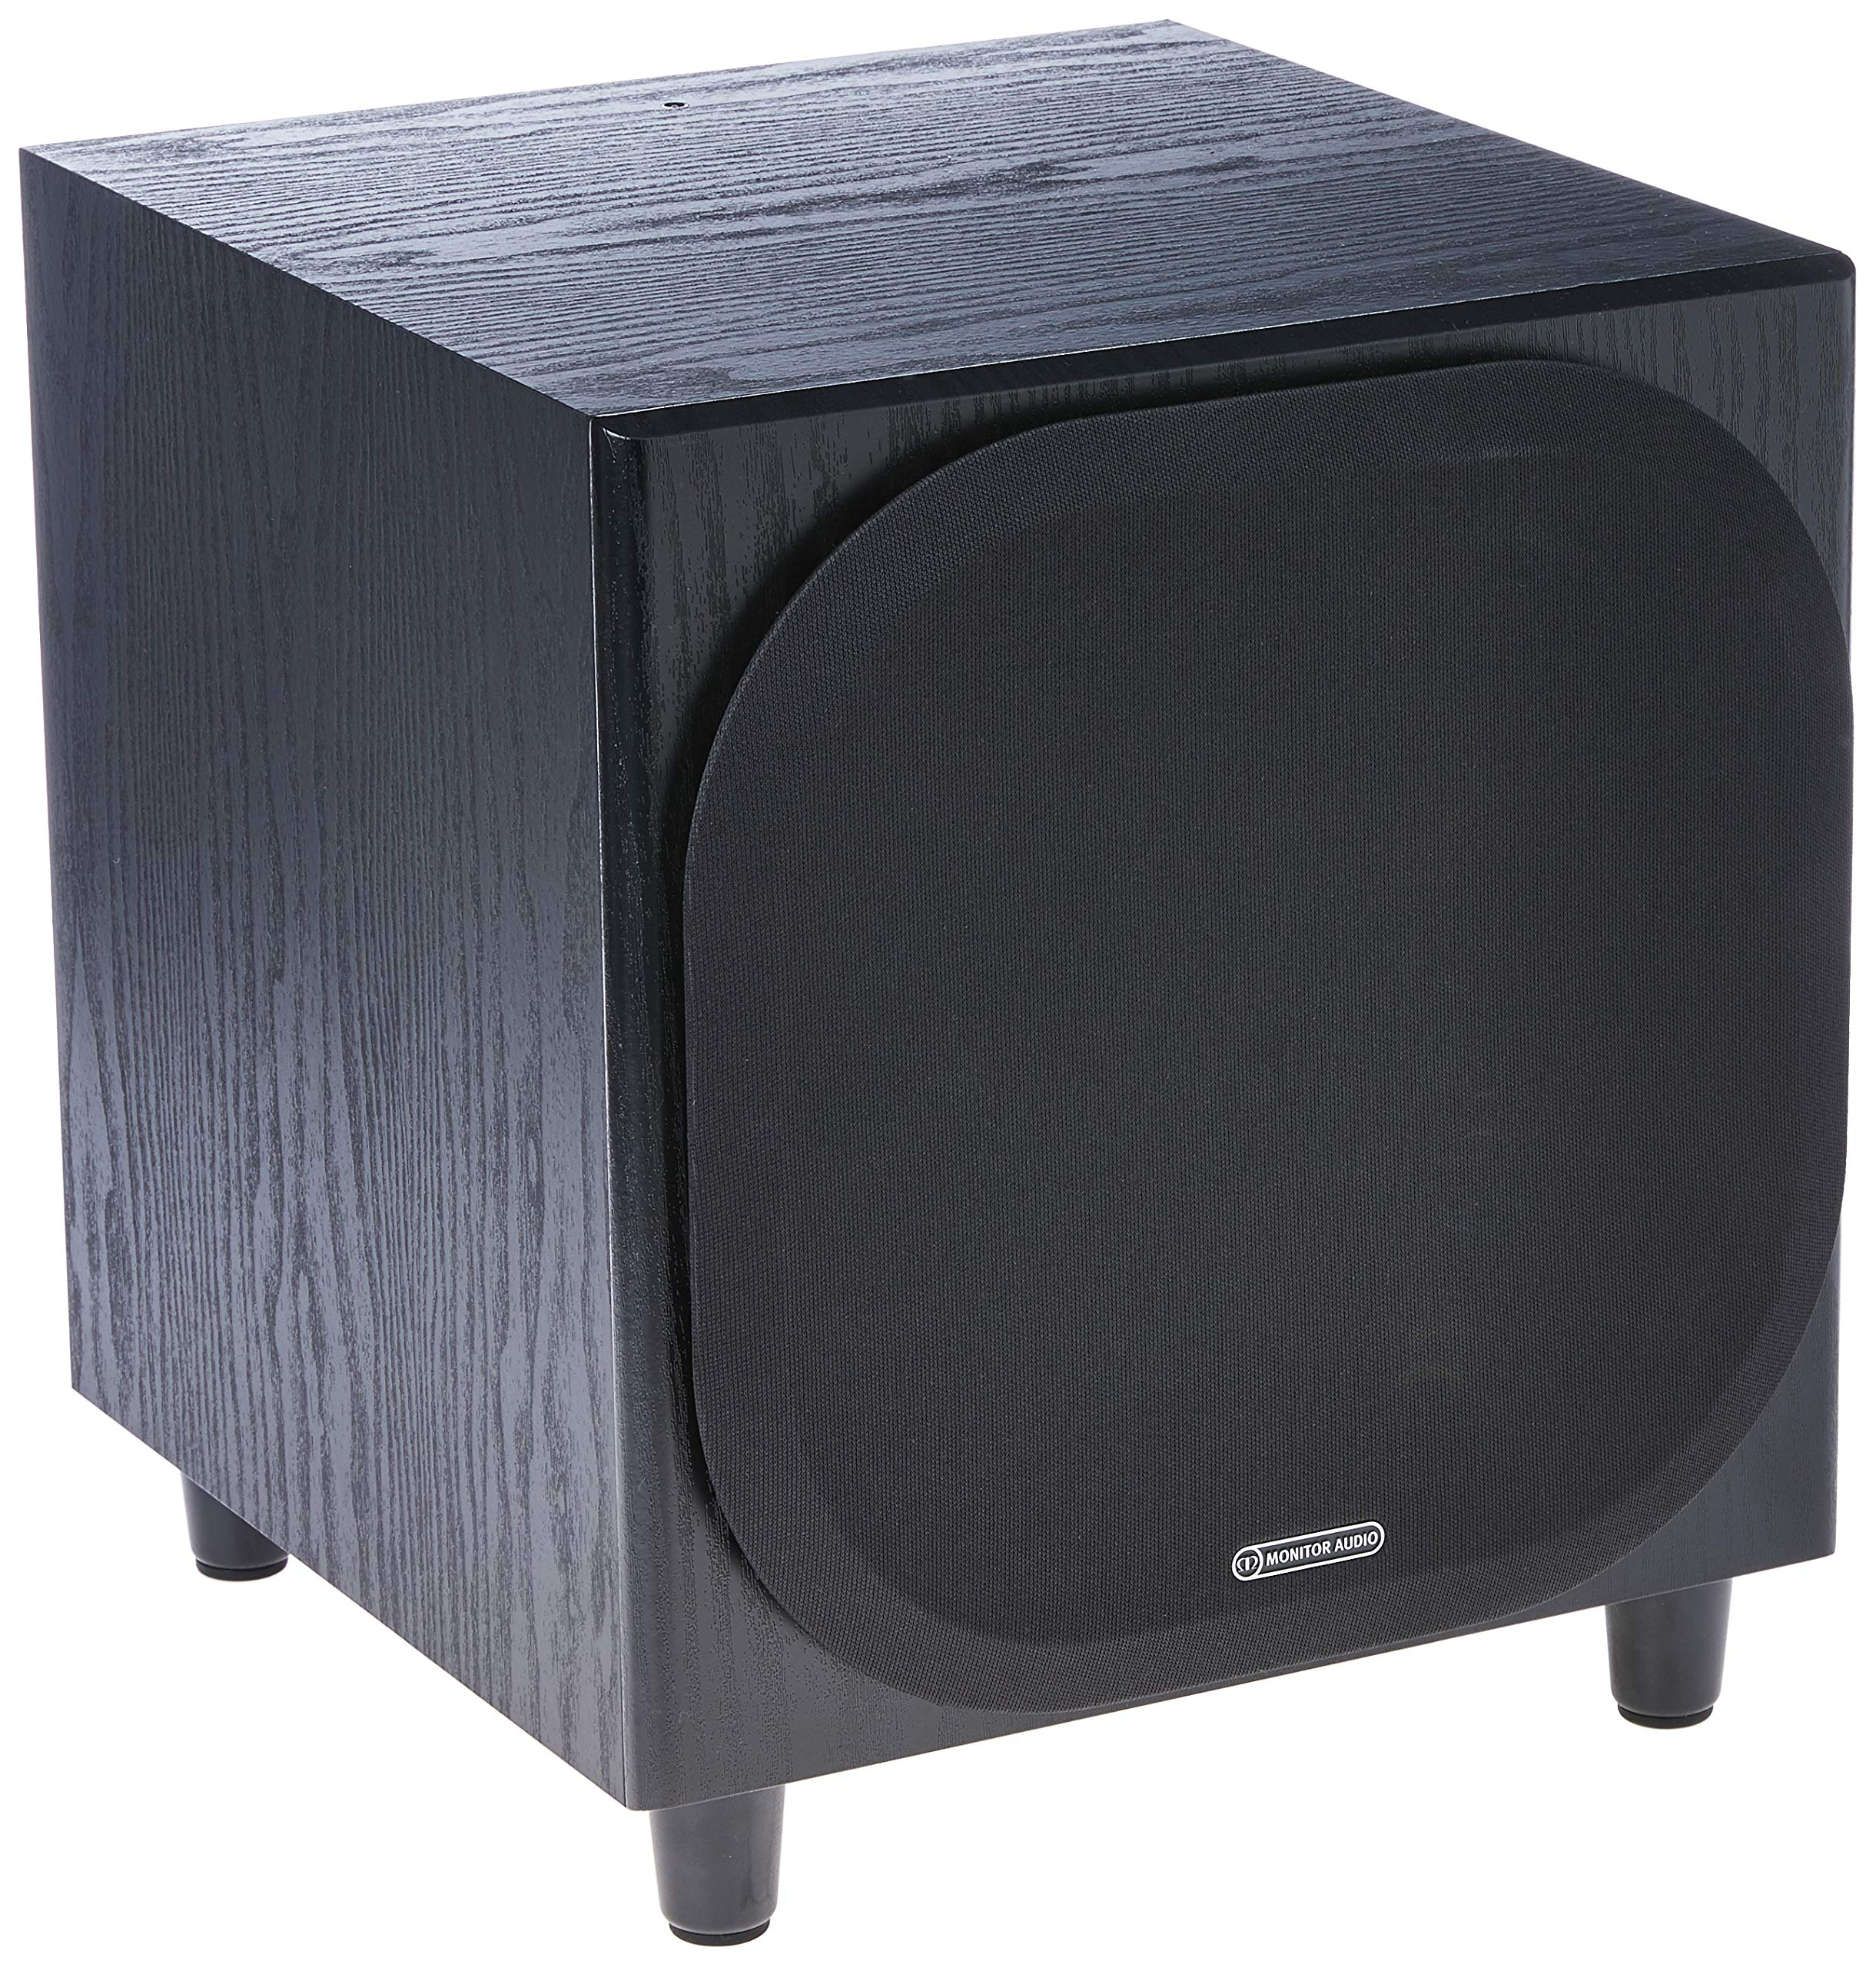 Monitor Audio - Bronze W10 Subwoofer - Black Oak Veneer